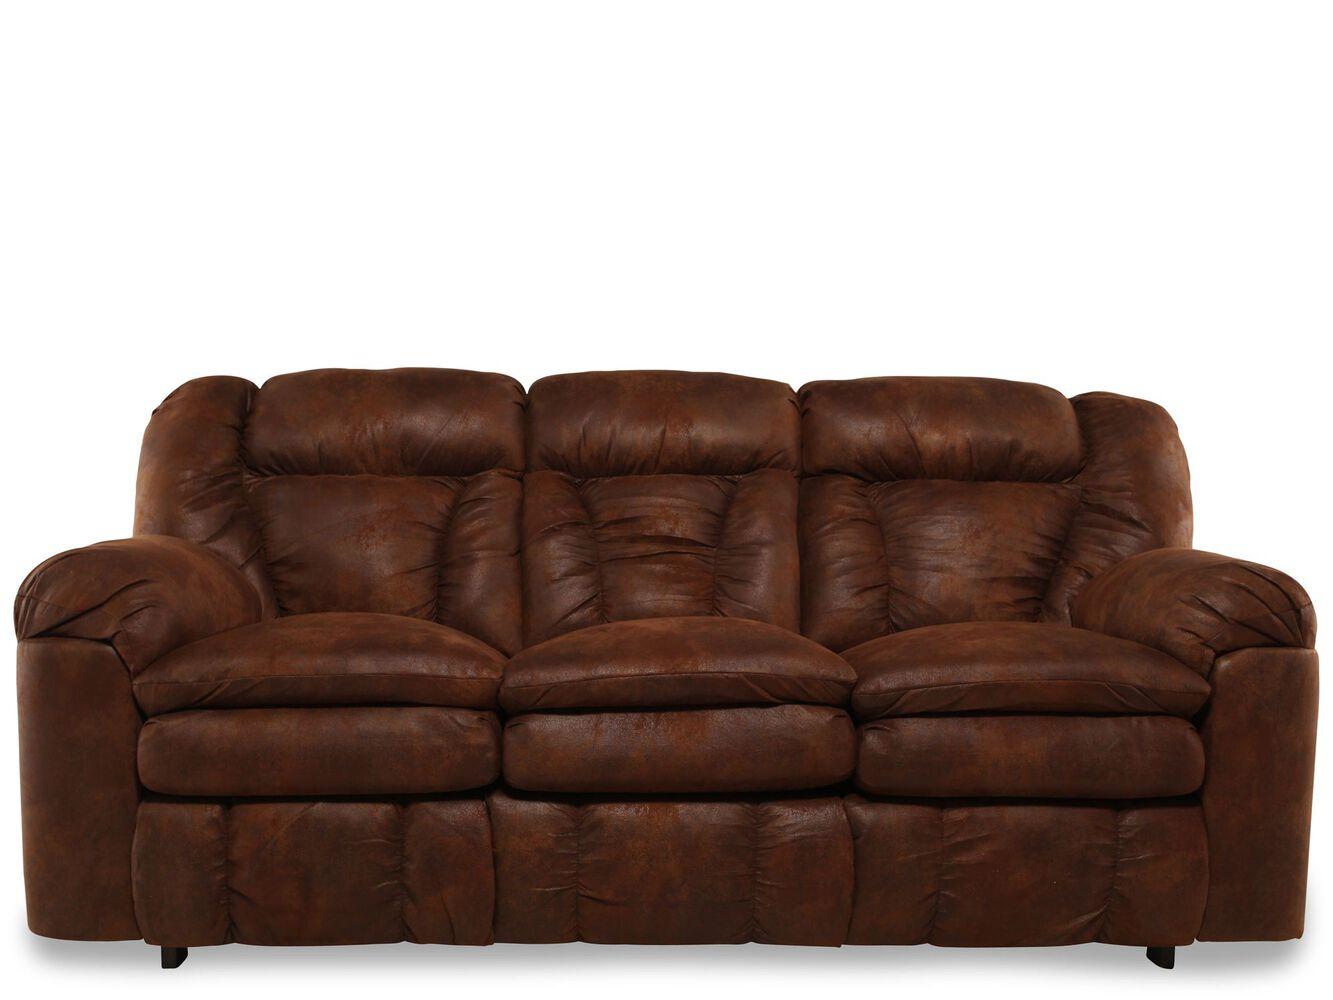 Lane talon coffee sleeper sofa mathis brothers furniture for Lane sectional sleeper sofa